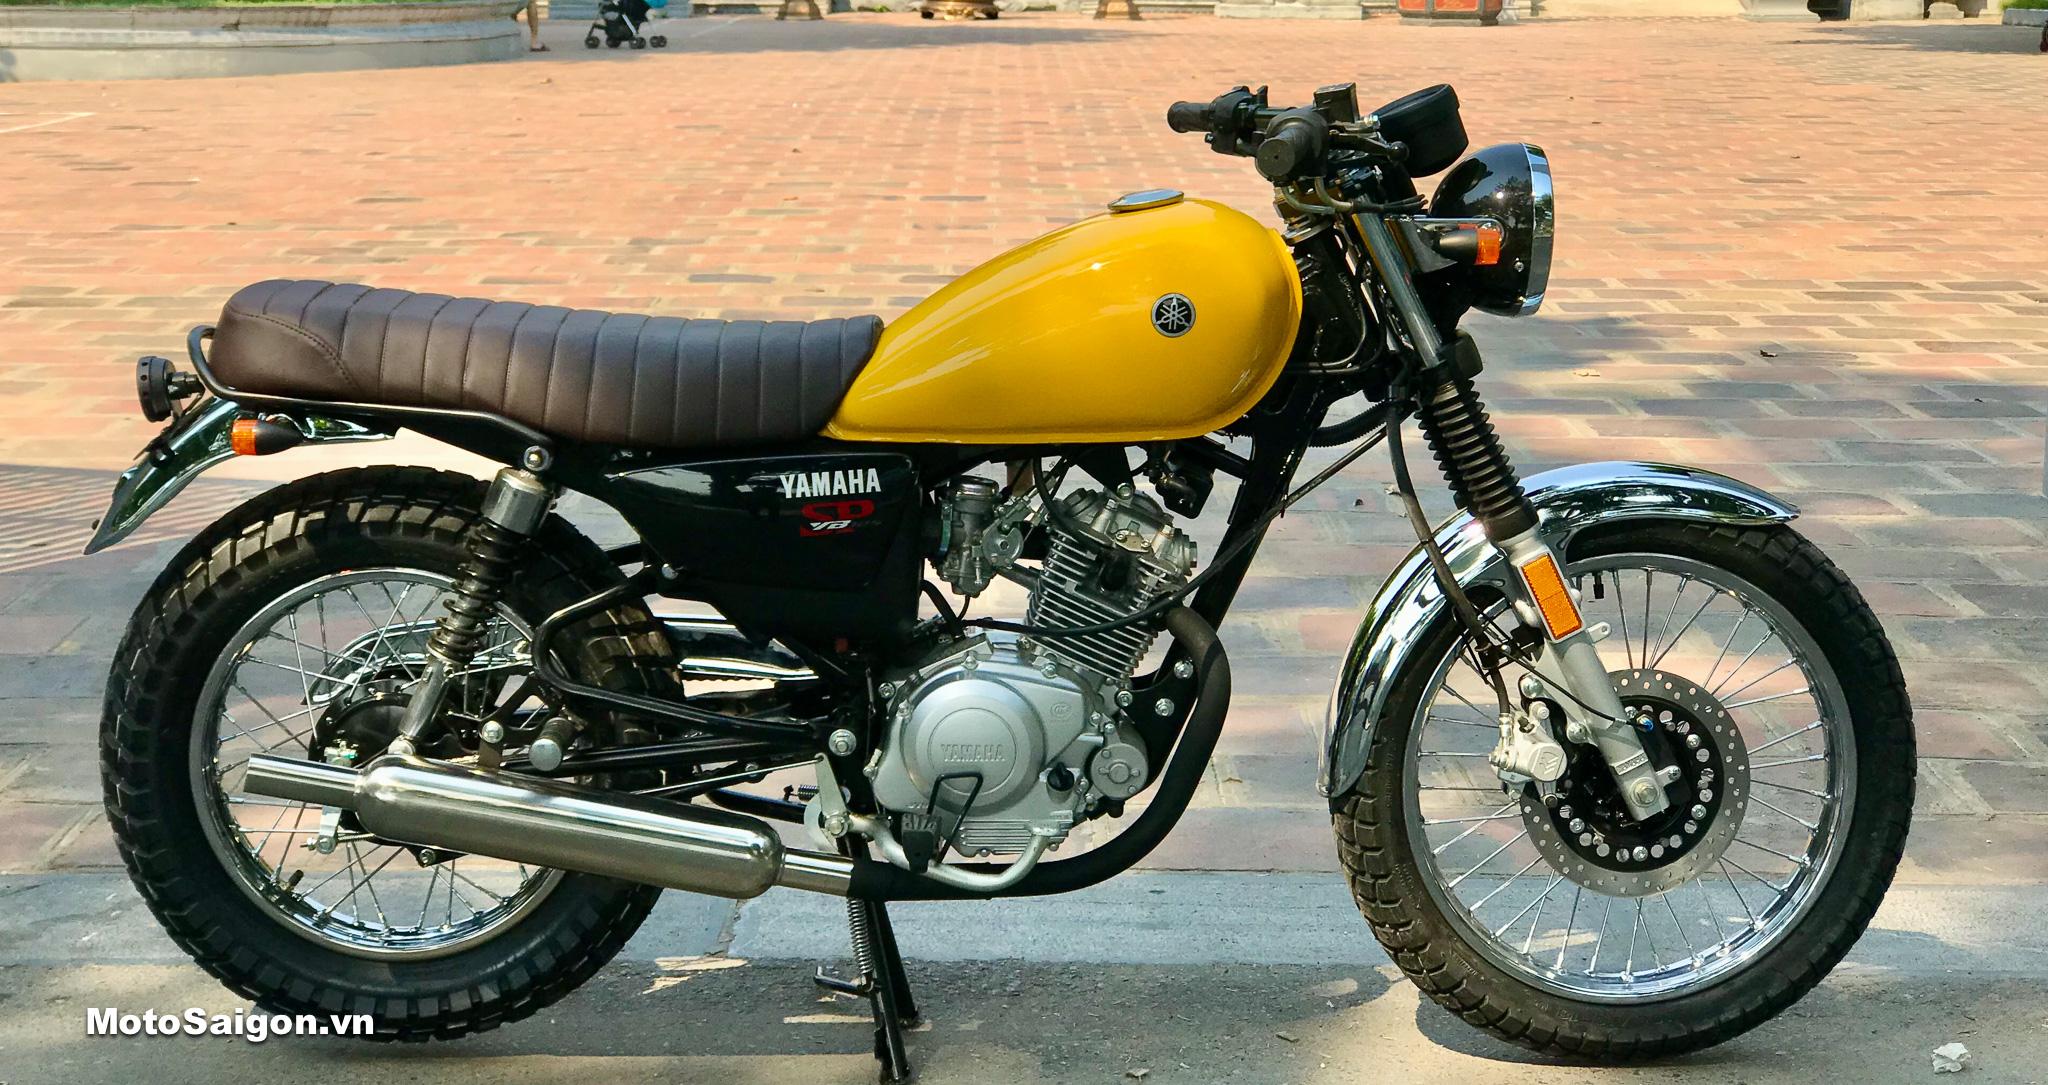 yamaha yb125 2020 do dep danh gia xe motosaigon 8